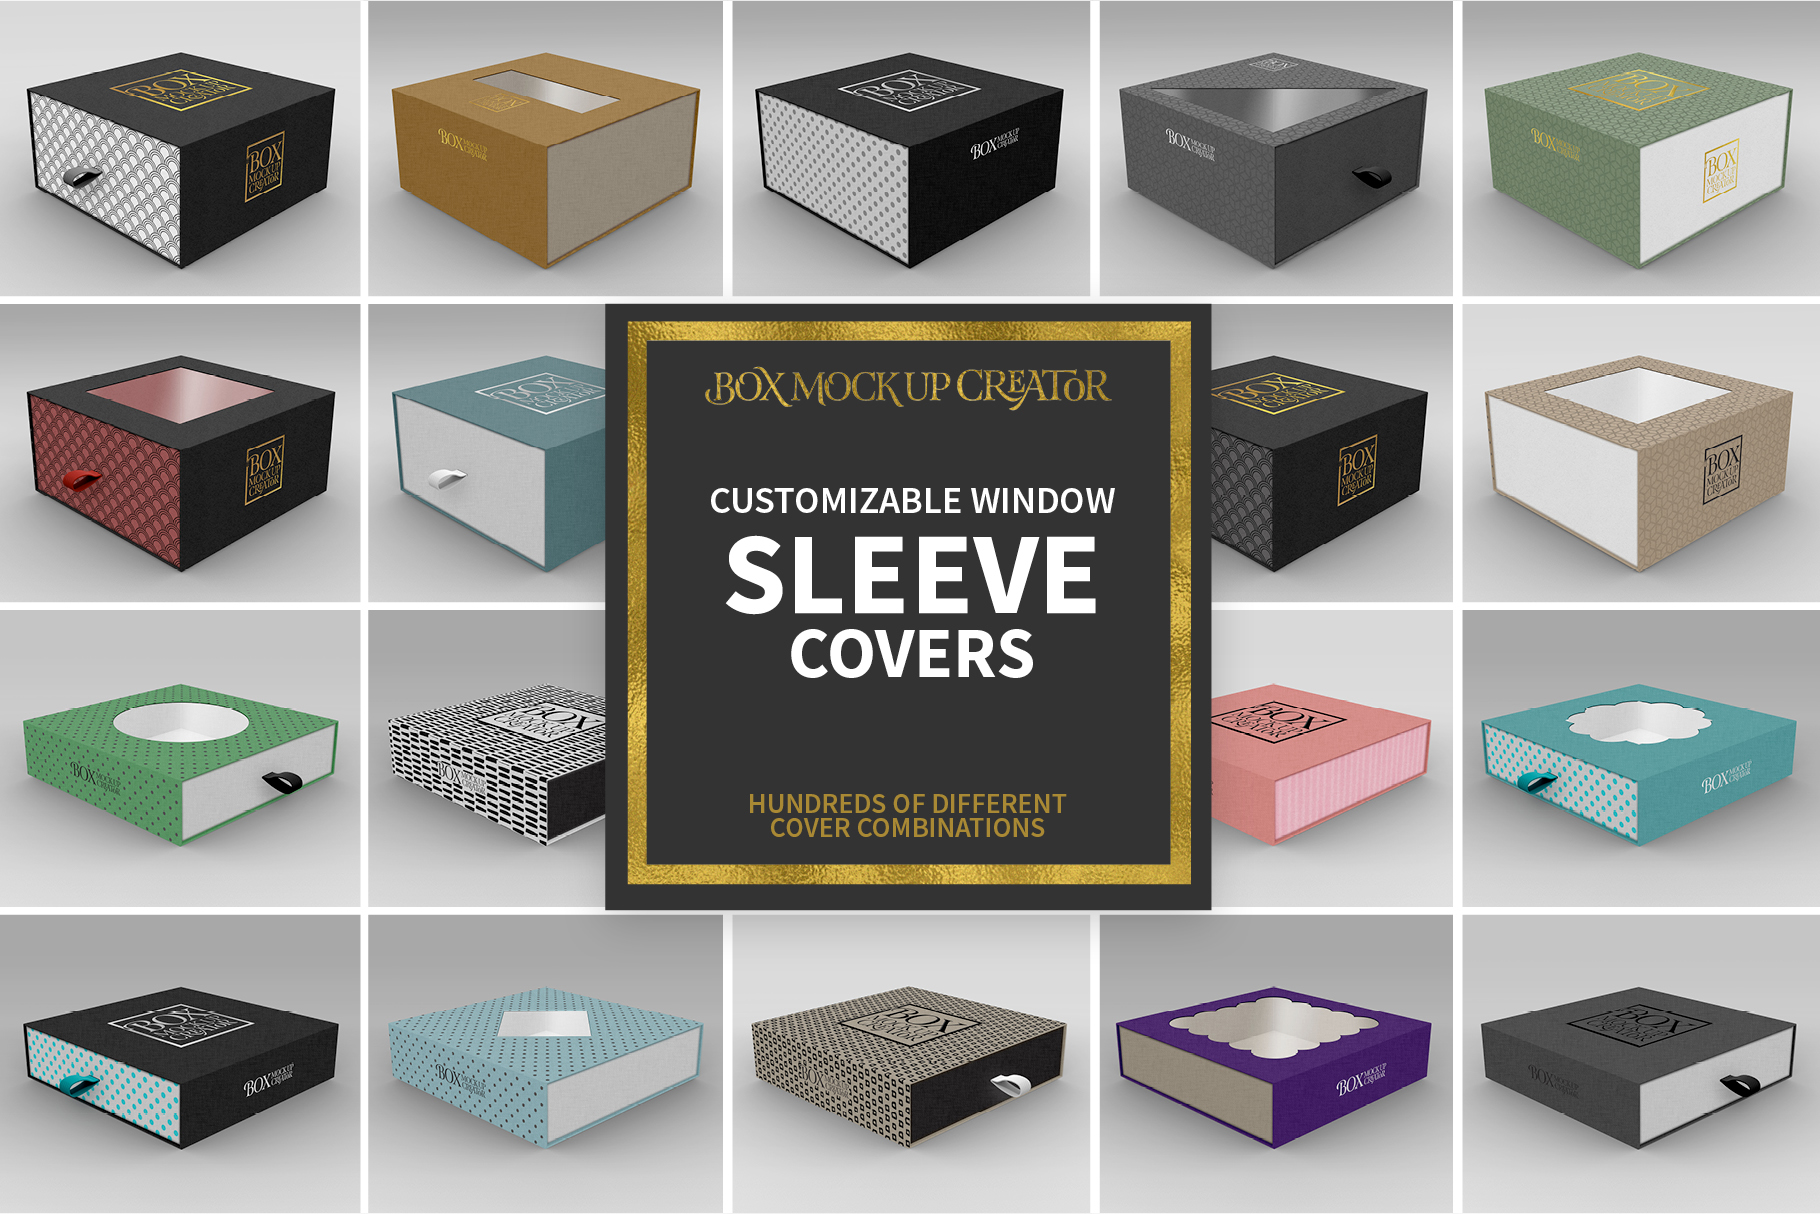 Square Box Packaging Mockup Creator example image 8